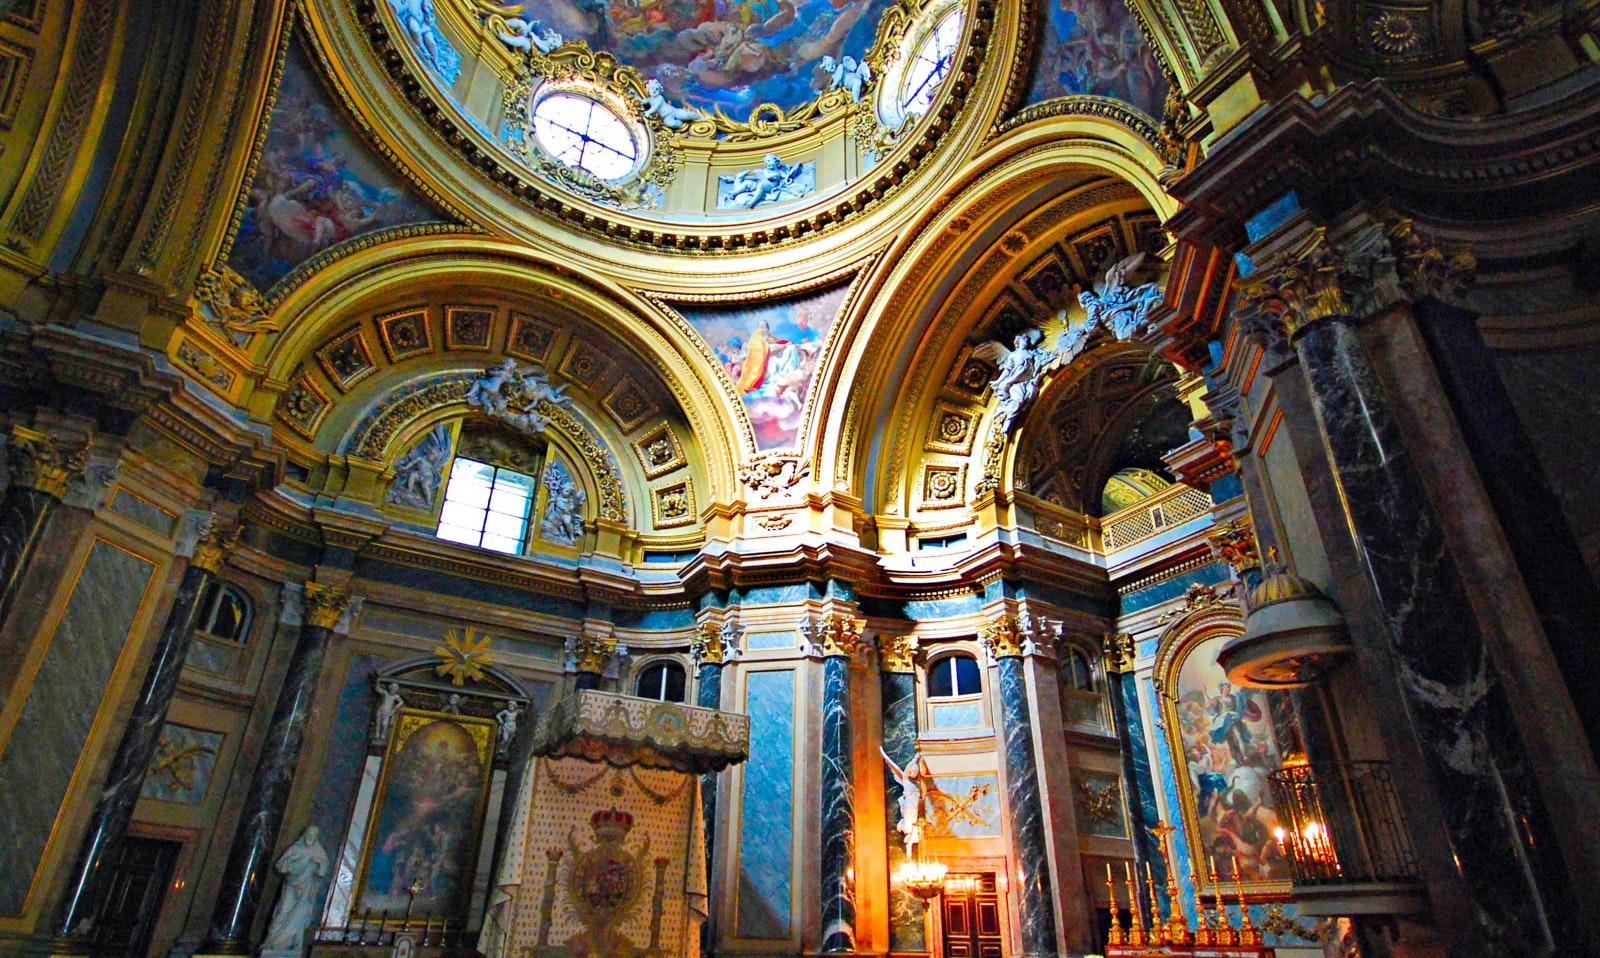 Madrid Royal Palace tours